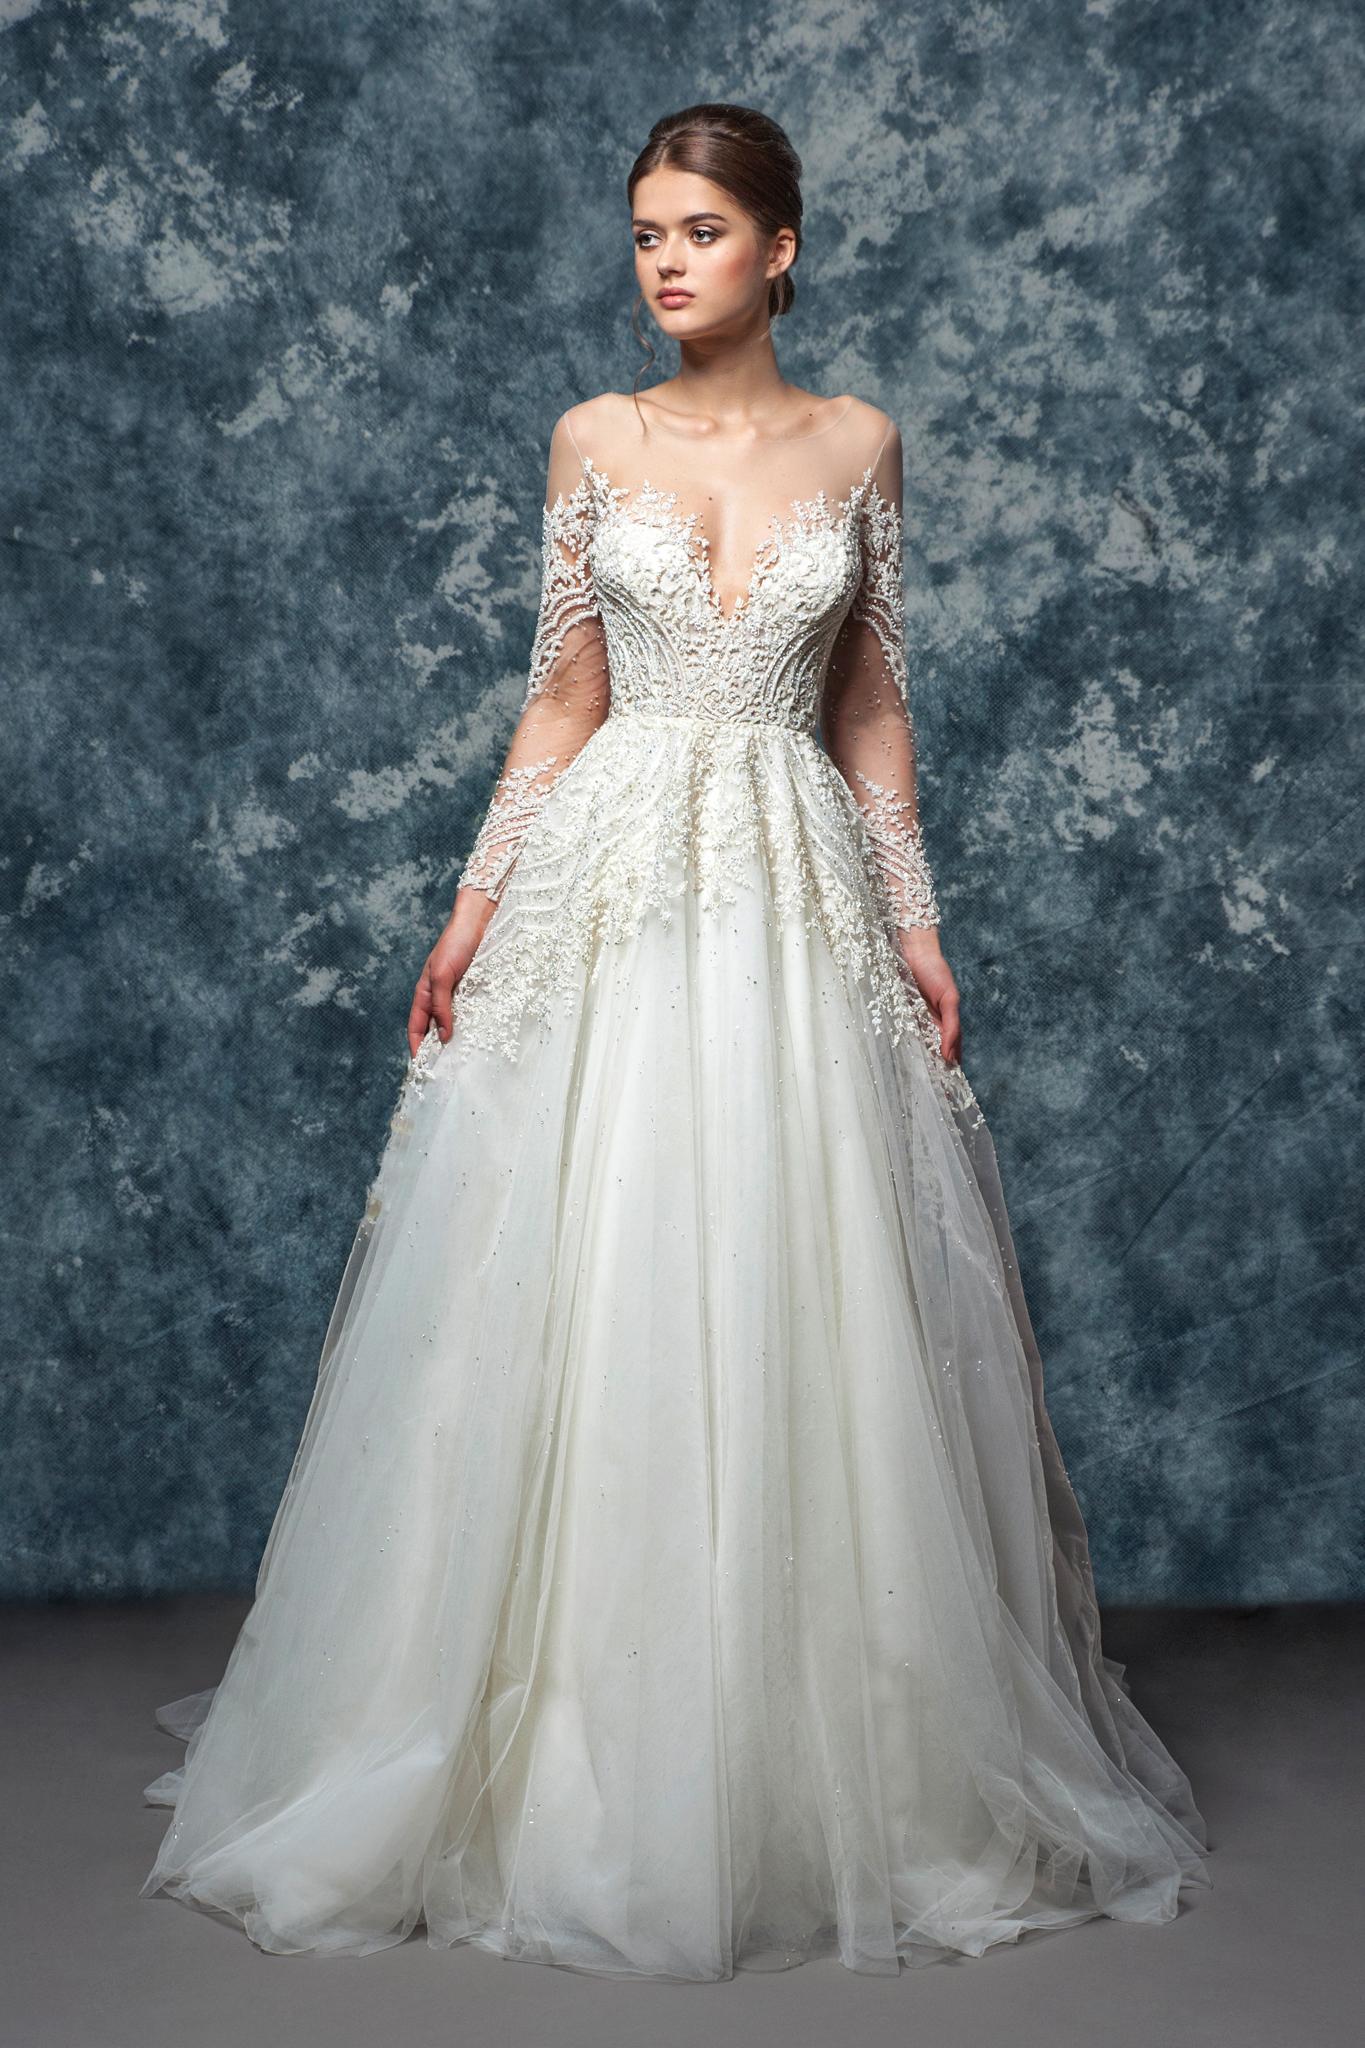 Illusion Sweetheart Neckline Long Sleeve A Line Wedding Dress